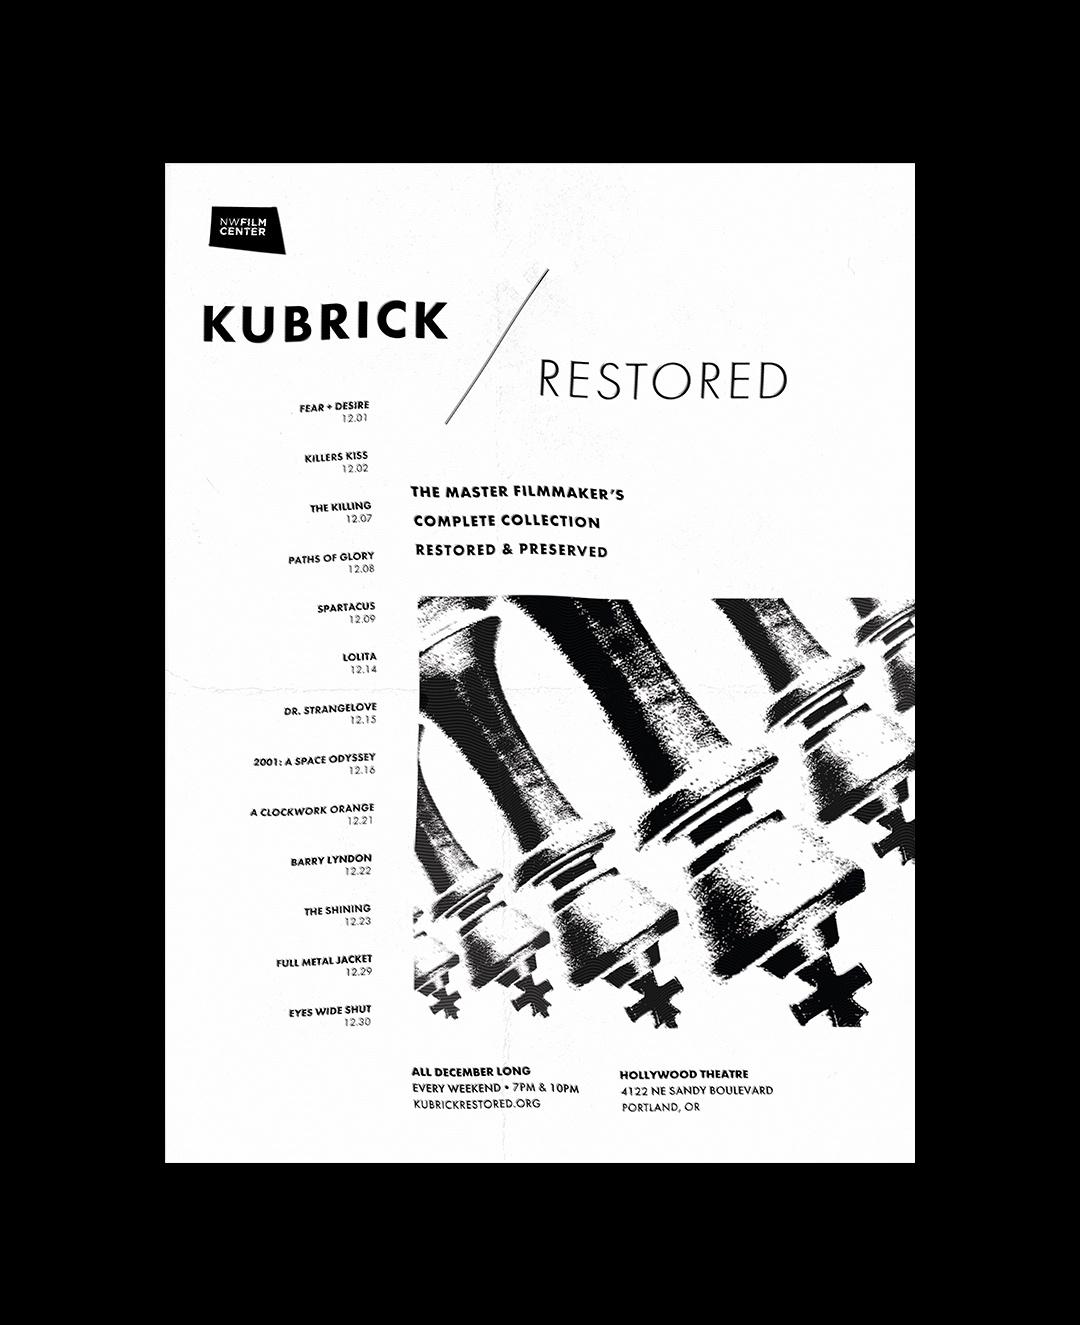 Kubrick / Restored (Festival Poster)